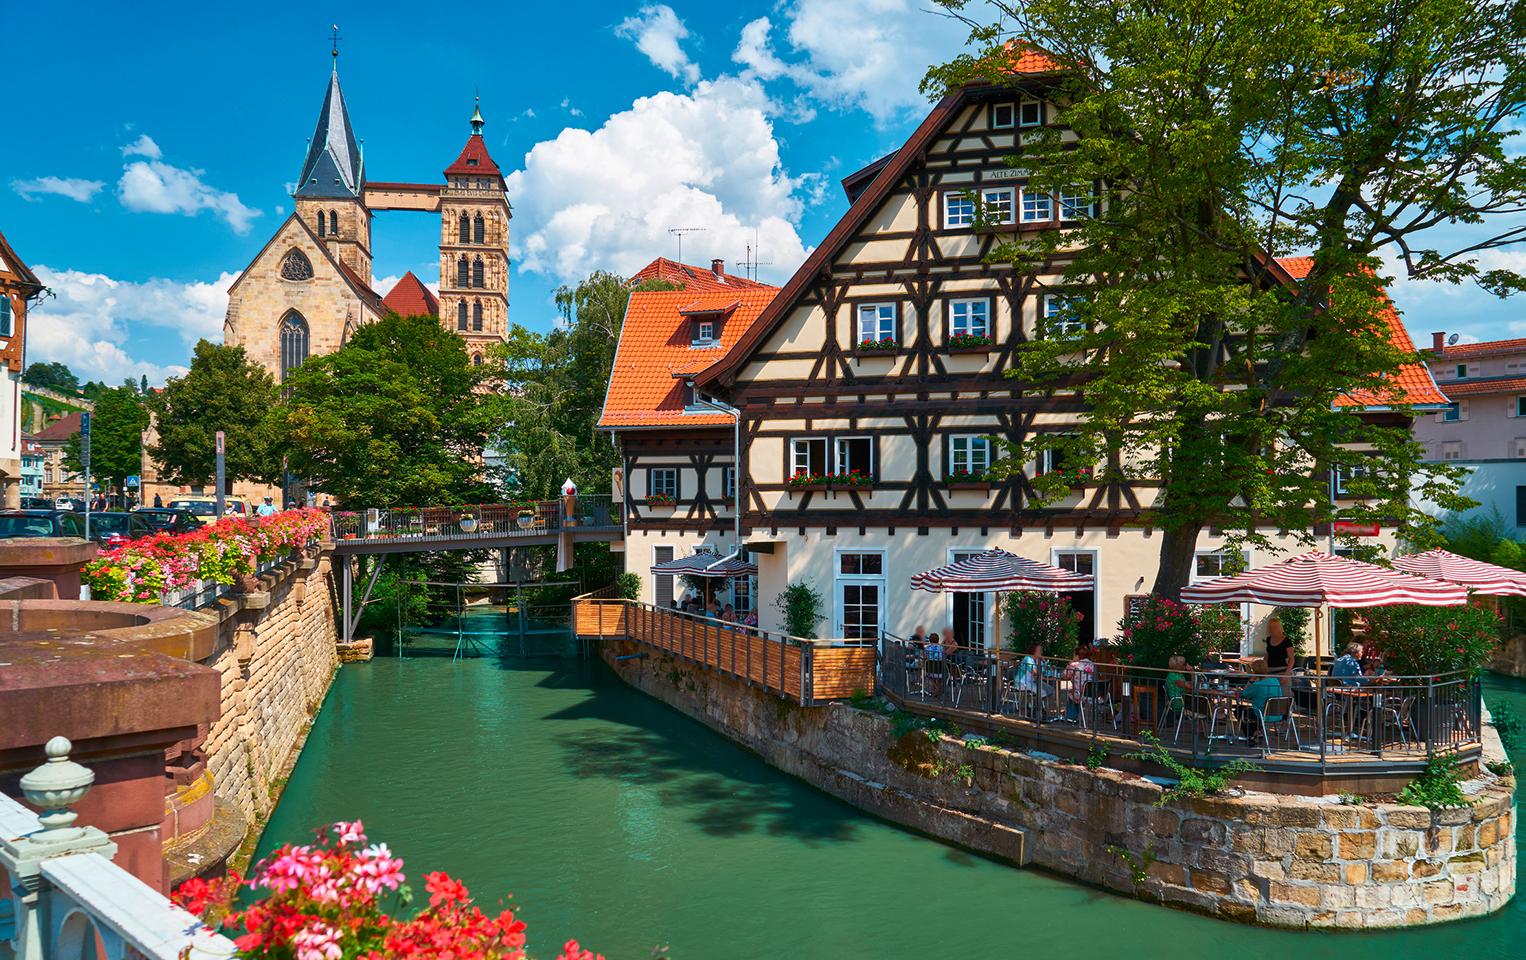 Baden Baden Germany Images